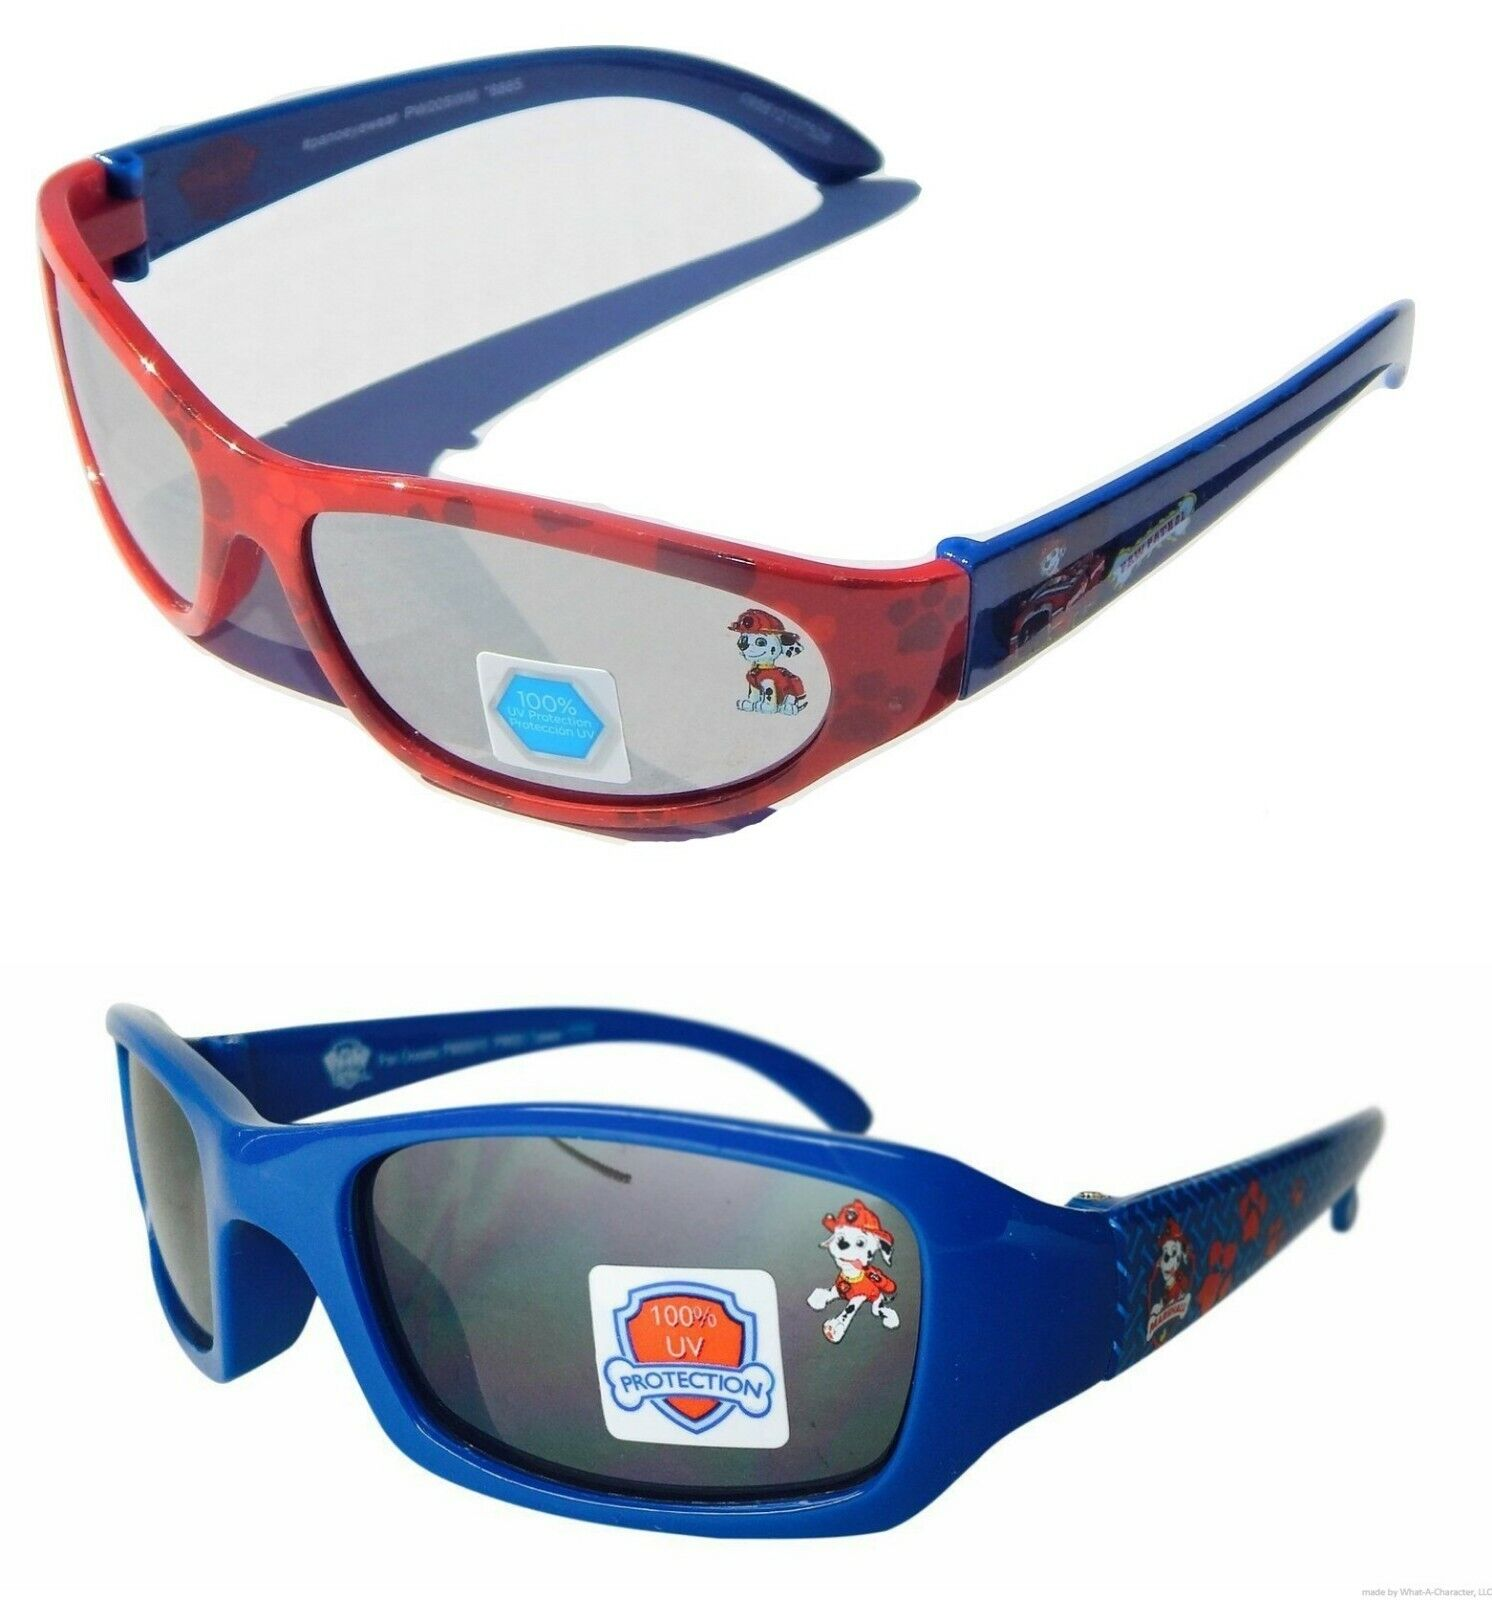 TROLLS PRINCESS POPPY Girls 100/% UV Shatter Resistant Costume Sunglasses NWT $13